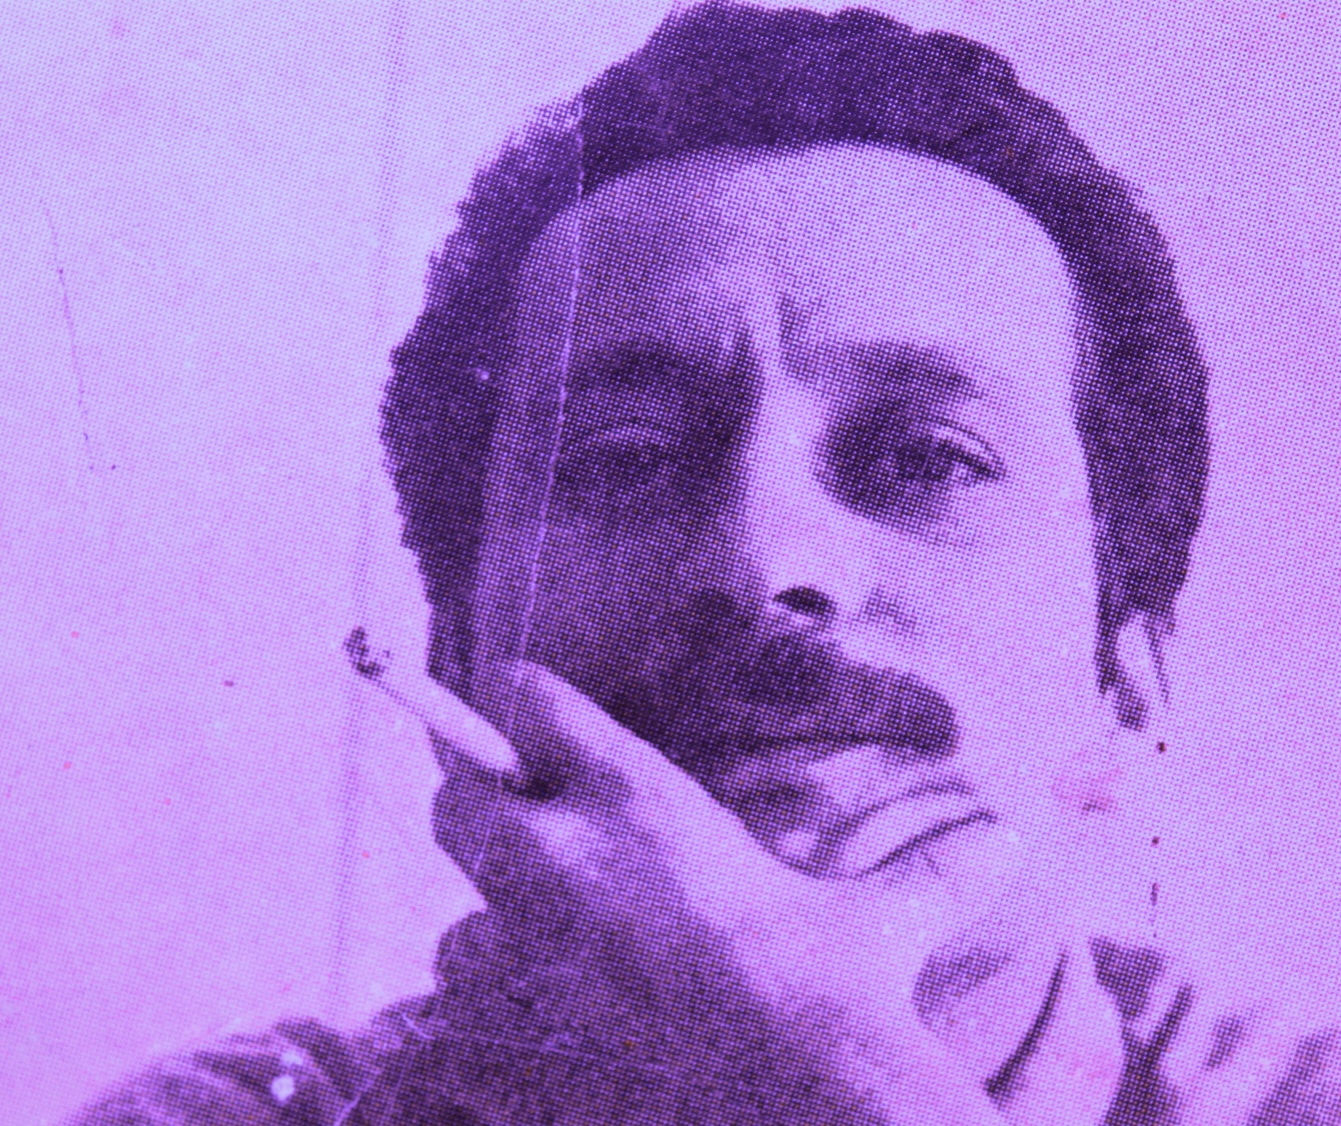 يوميات غسان كنفاني... (1959 ـ 1965) (2/2)